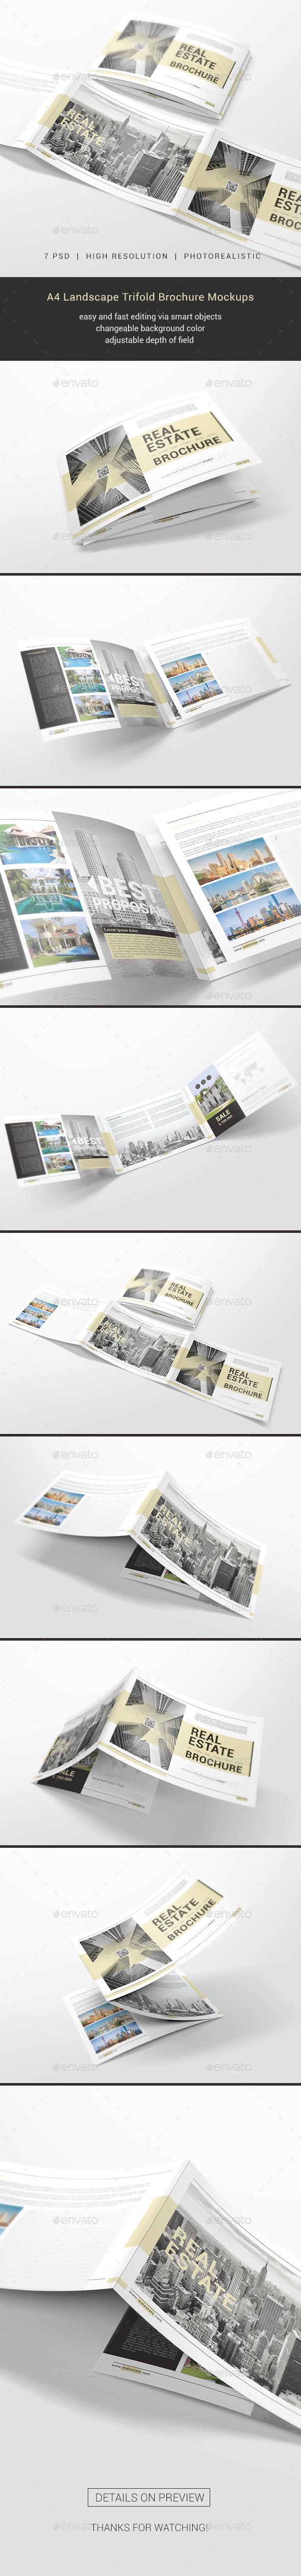 GraphicRiver A4 Trifold Brochure Mockups 21168451